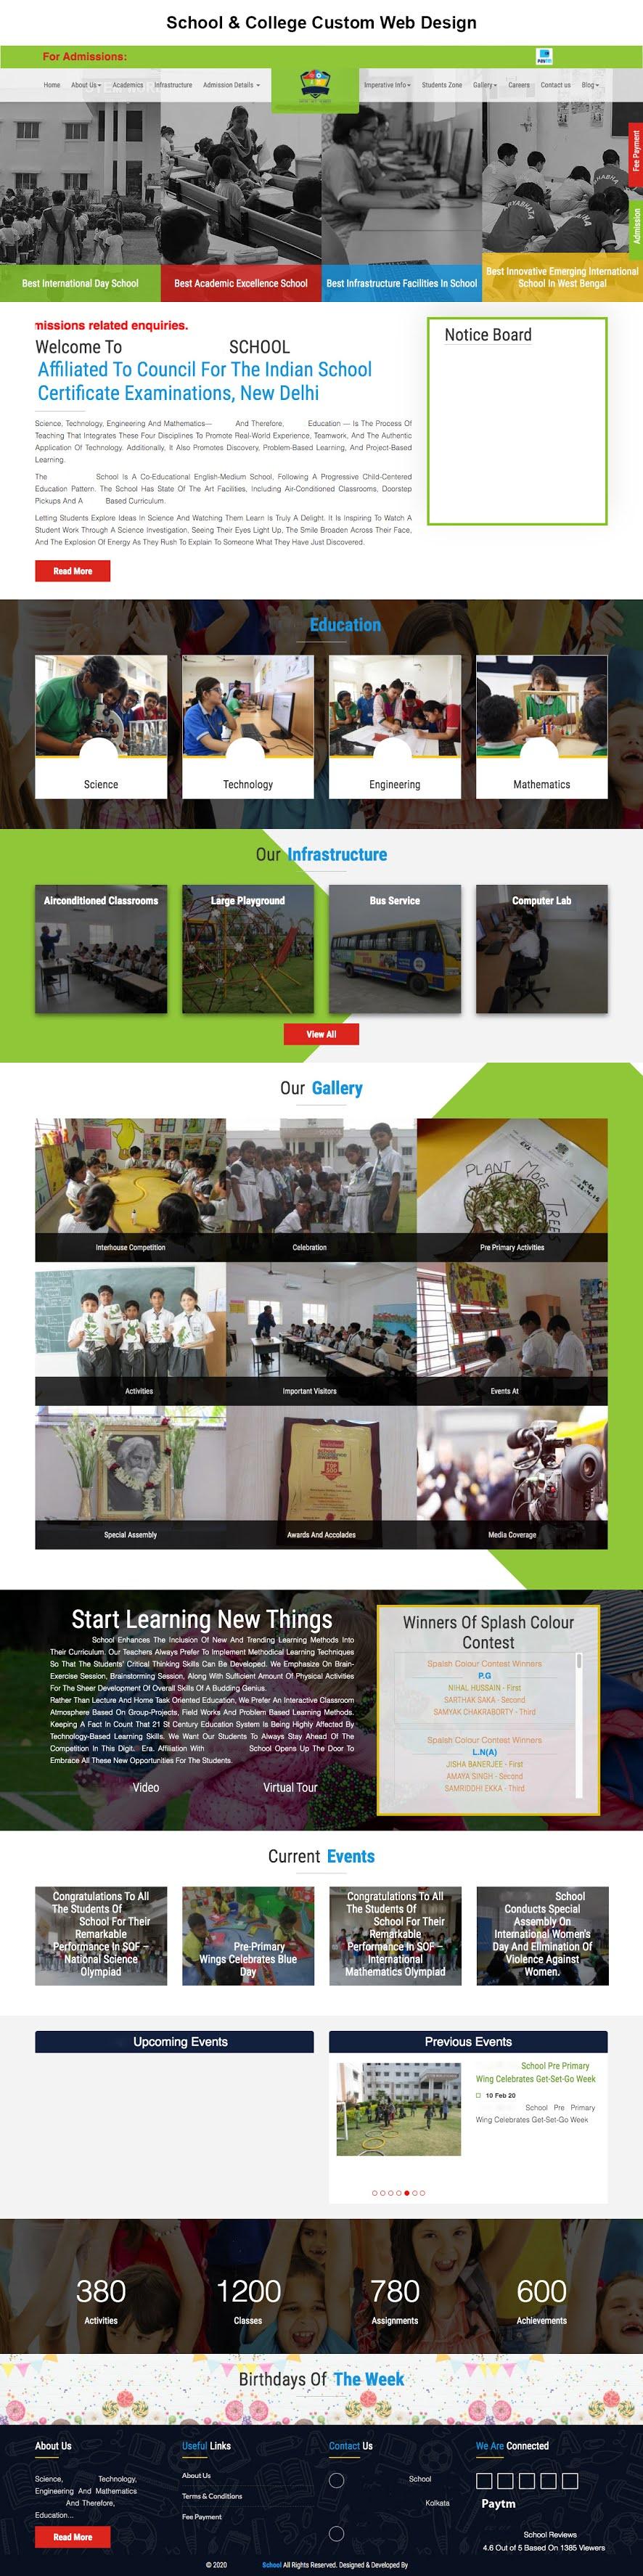 School & College Custom Web Design